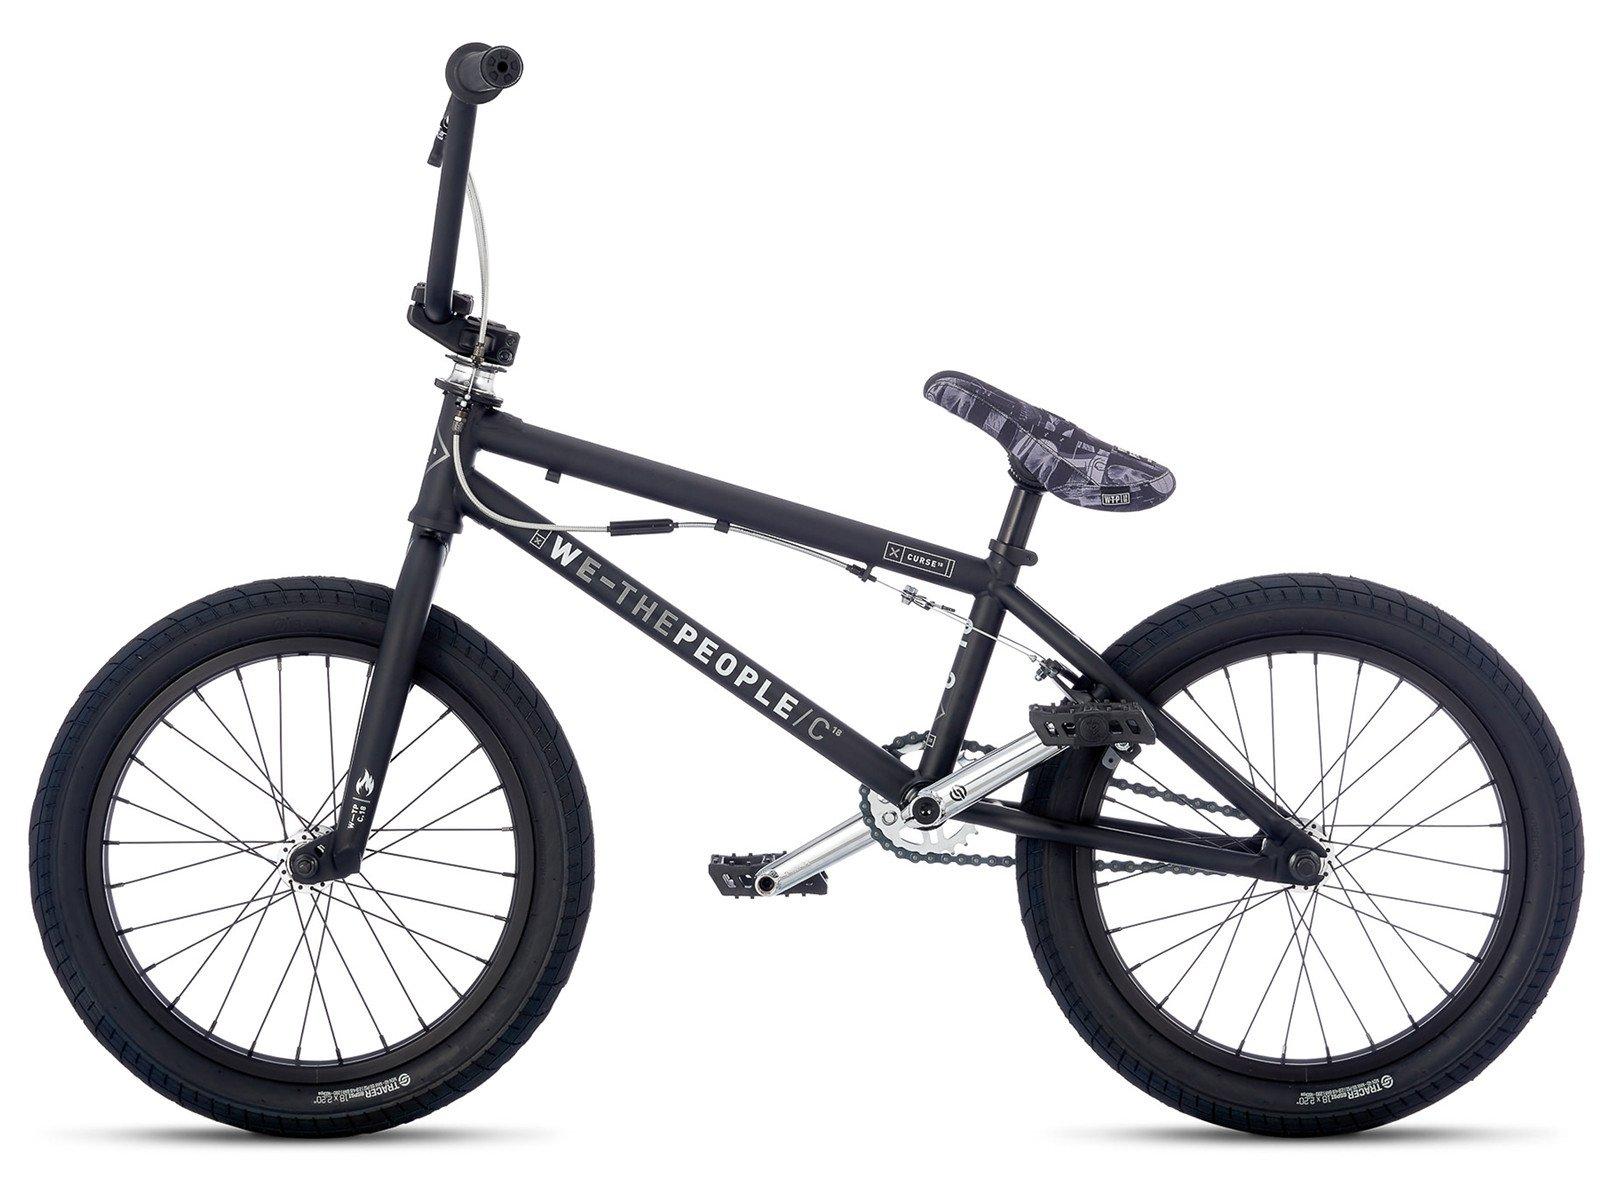 Wethepeople Quot Curse Fs 18 Quot 2017 Bmx Bike 18 Inch Matt